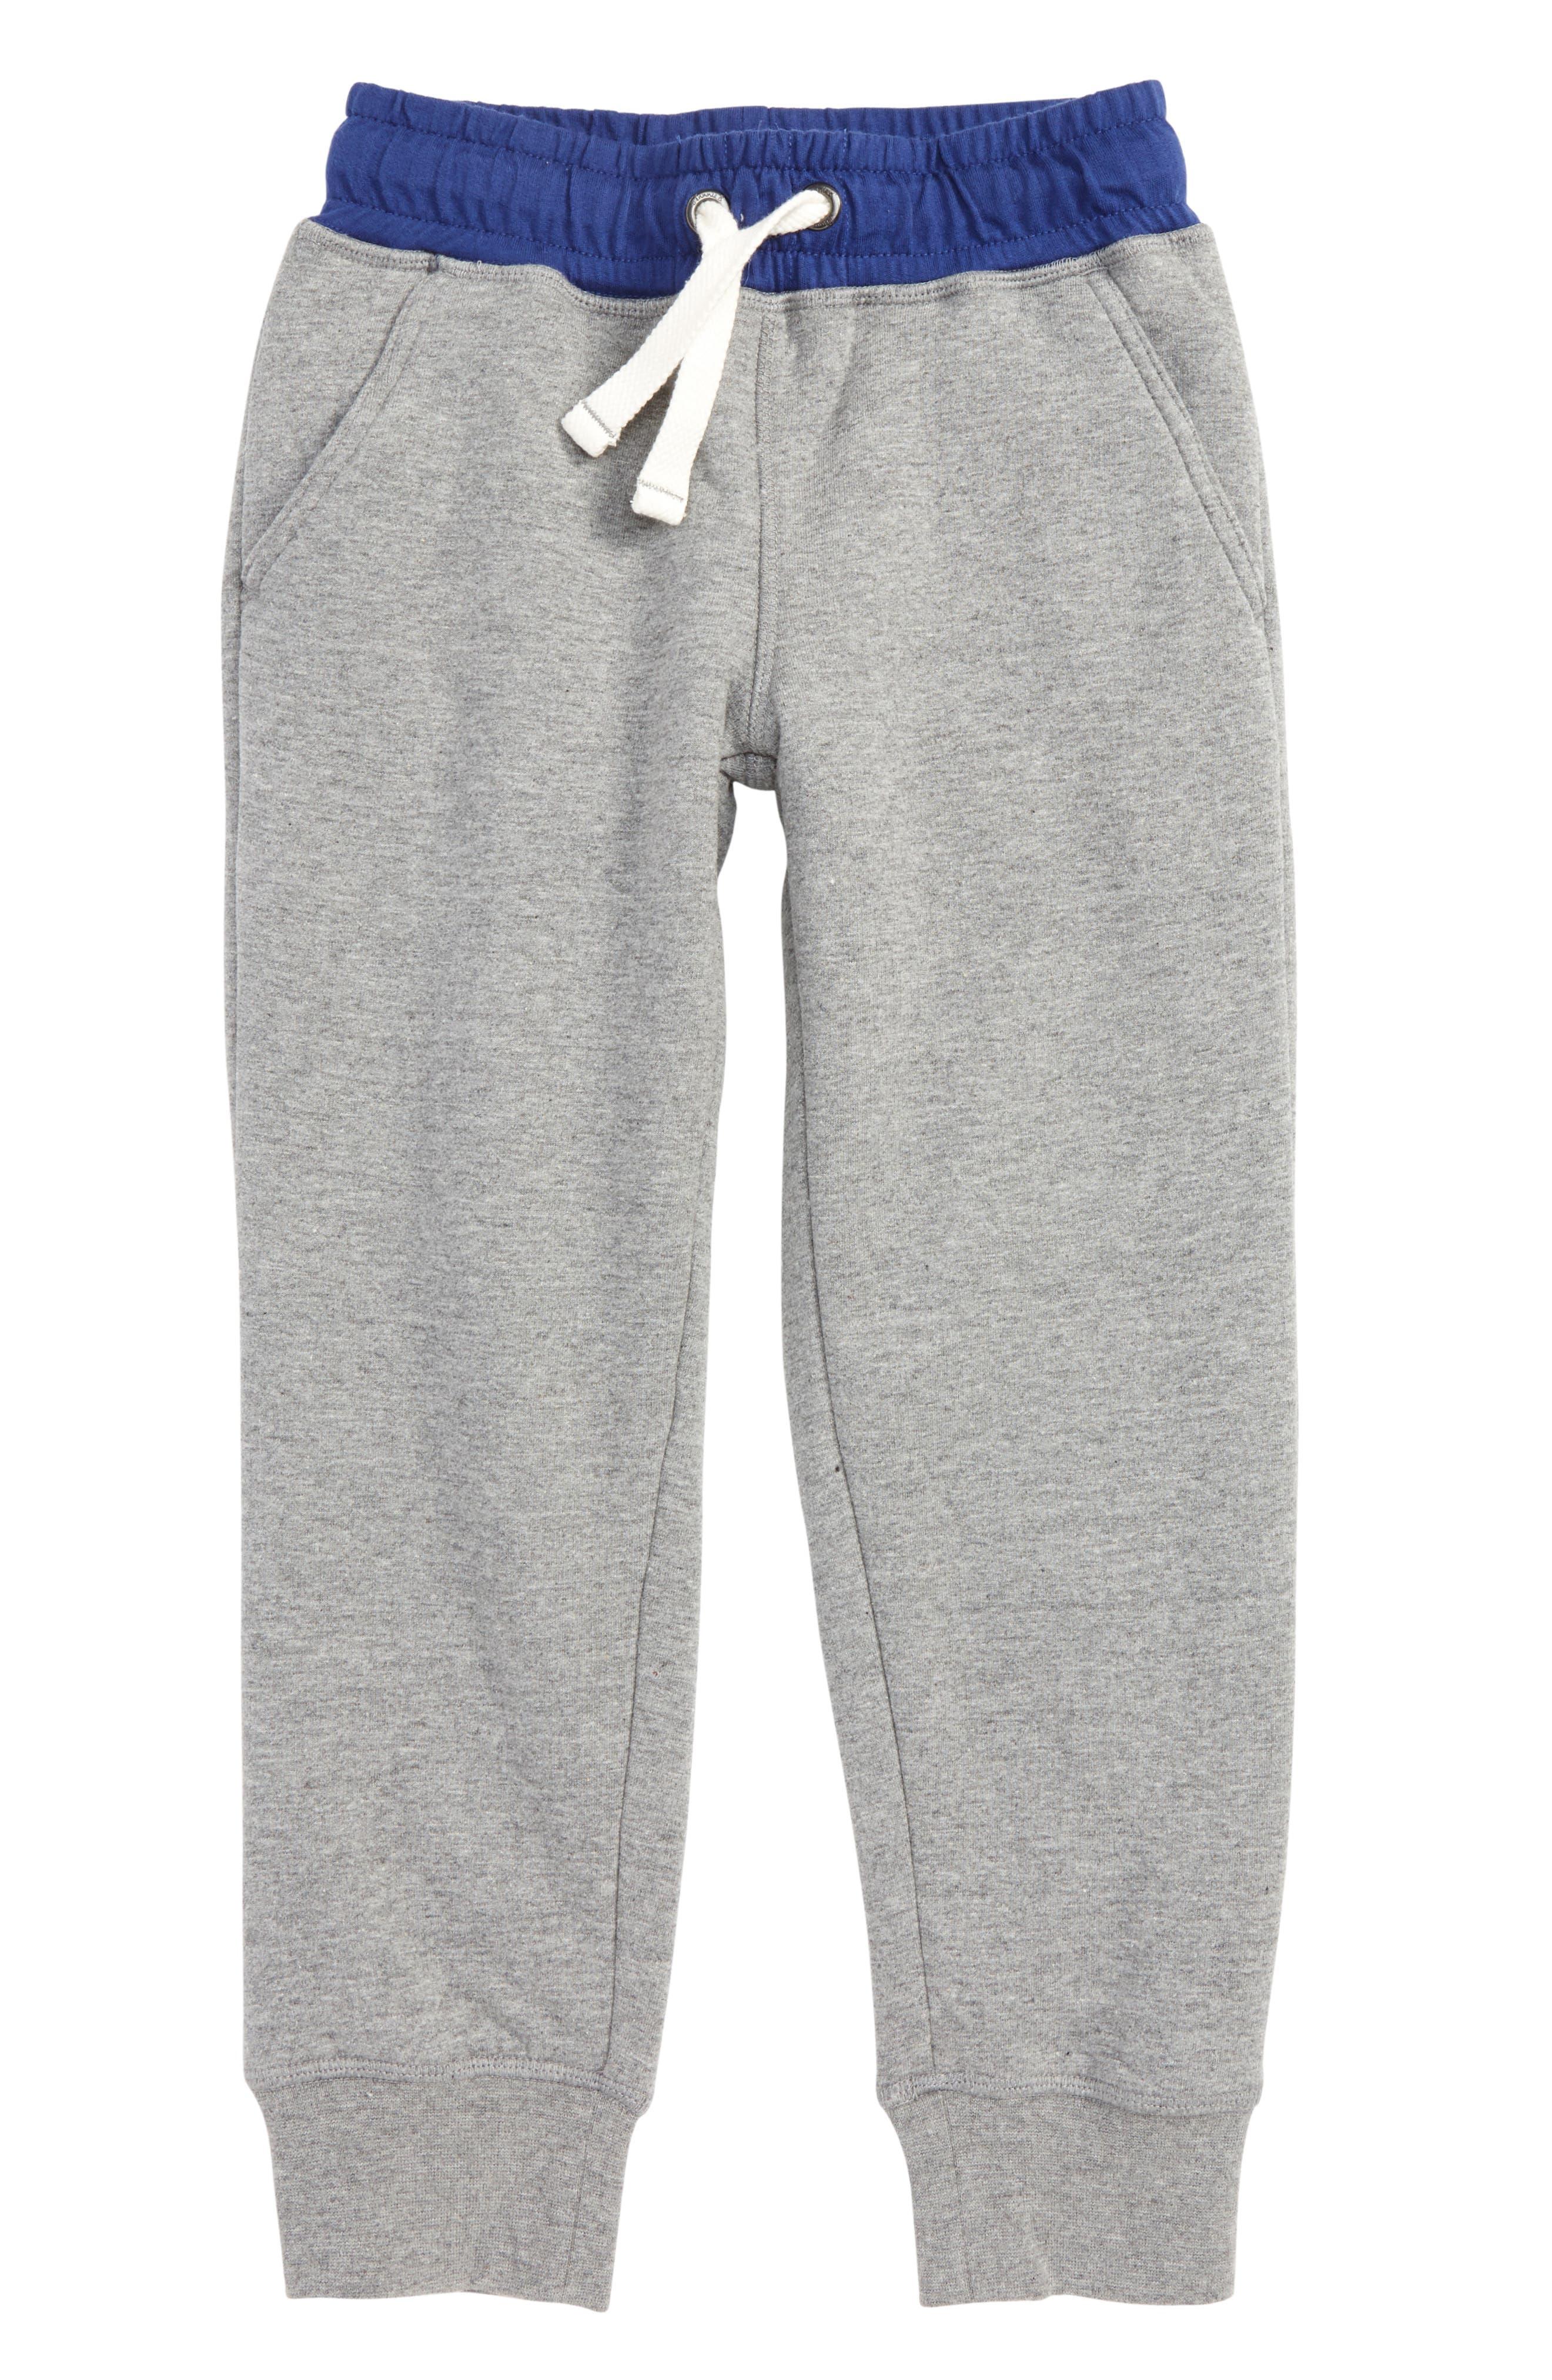 Shaggy Jogger Pants,                         Main,                         color, 062